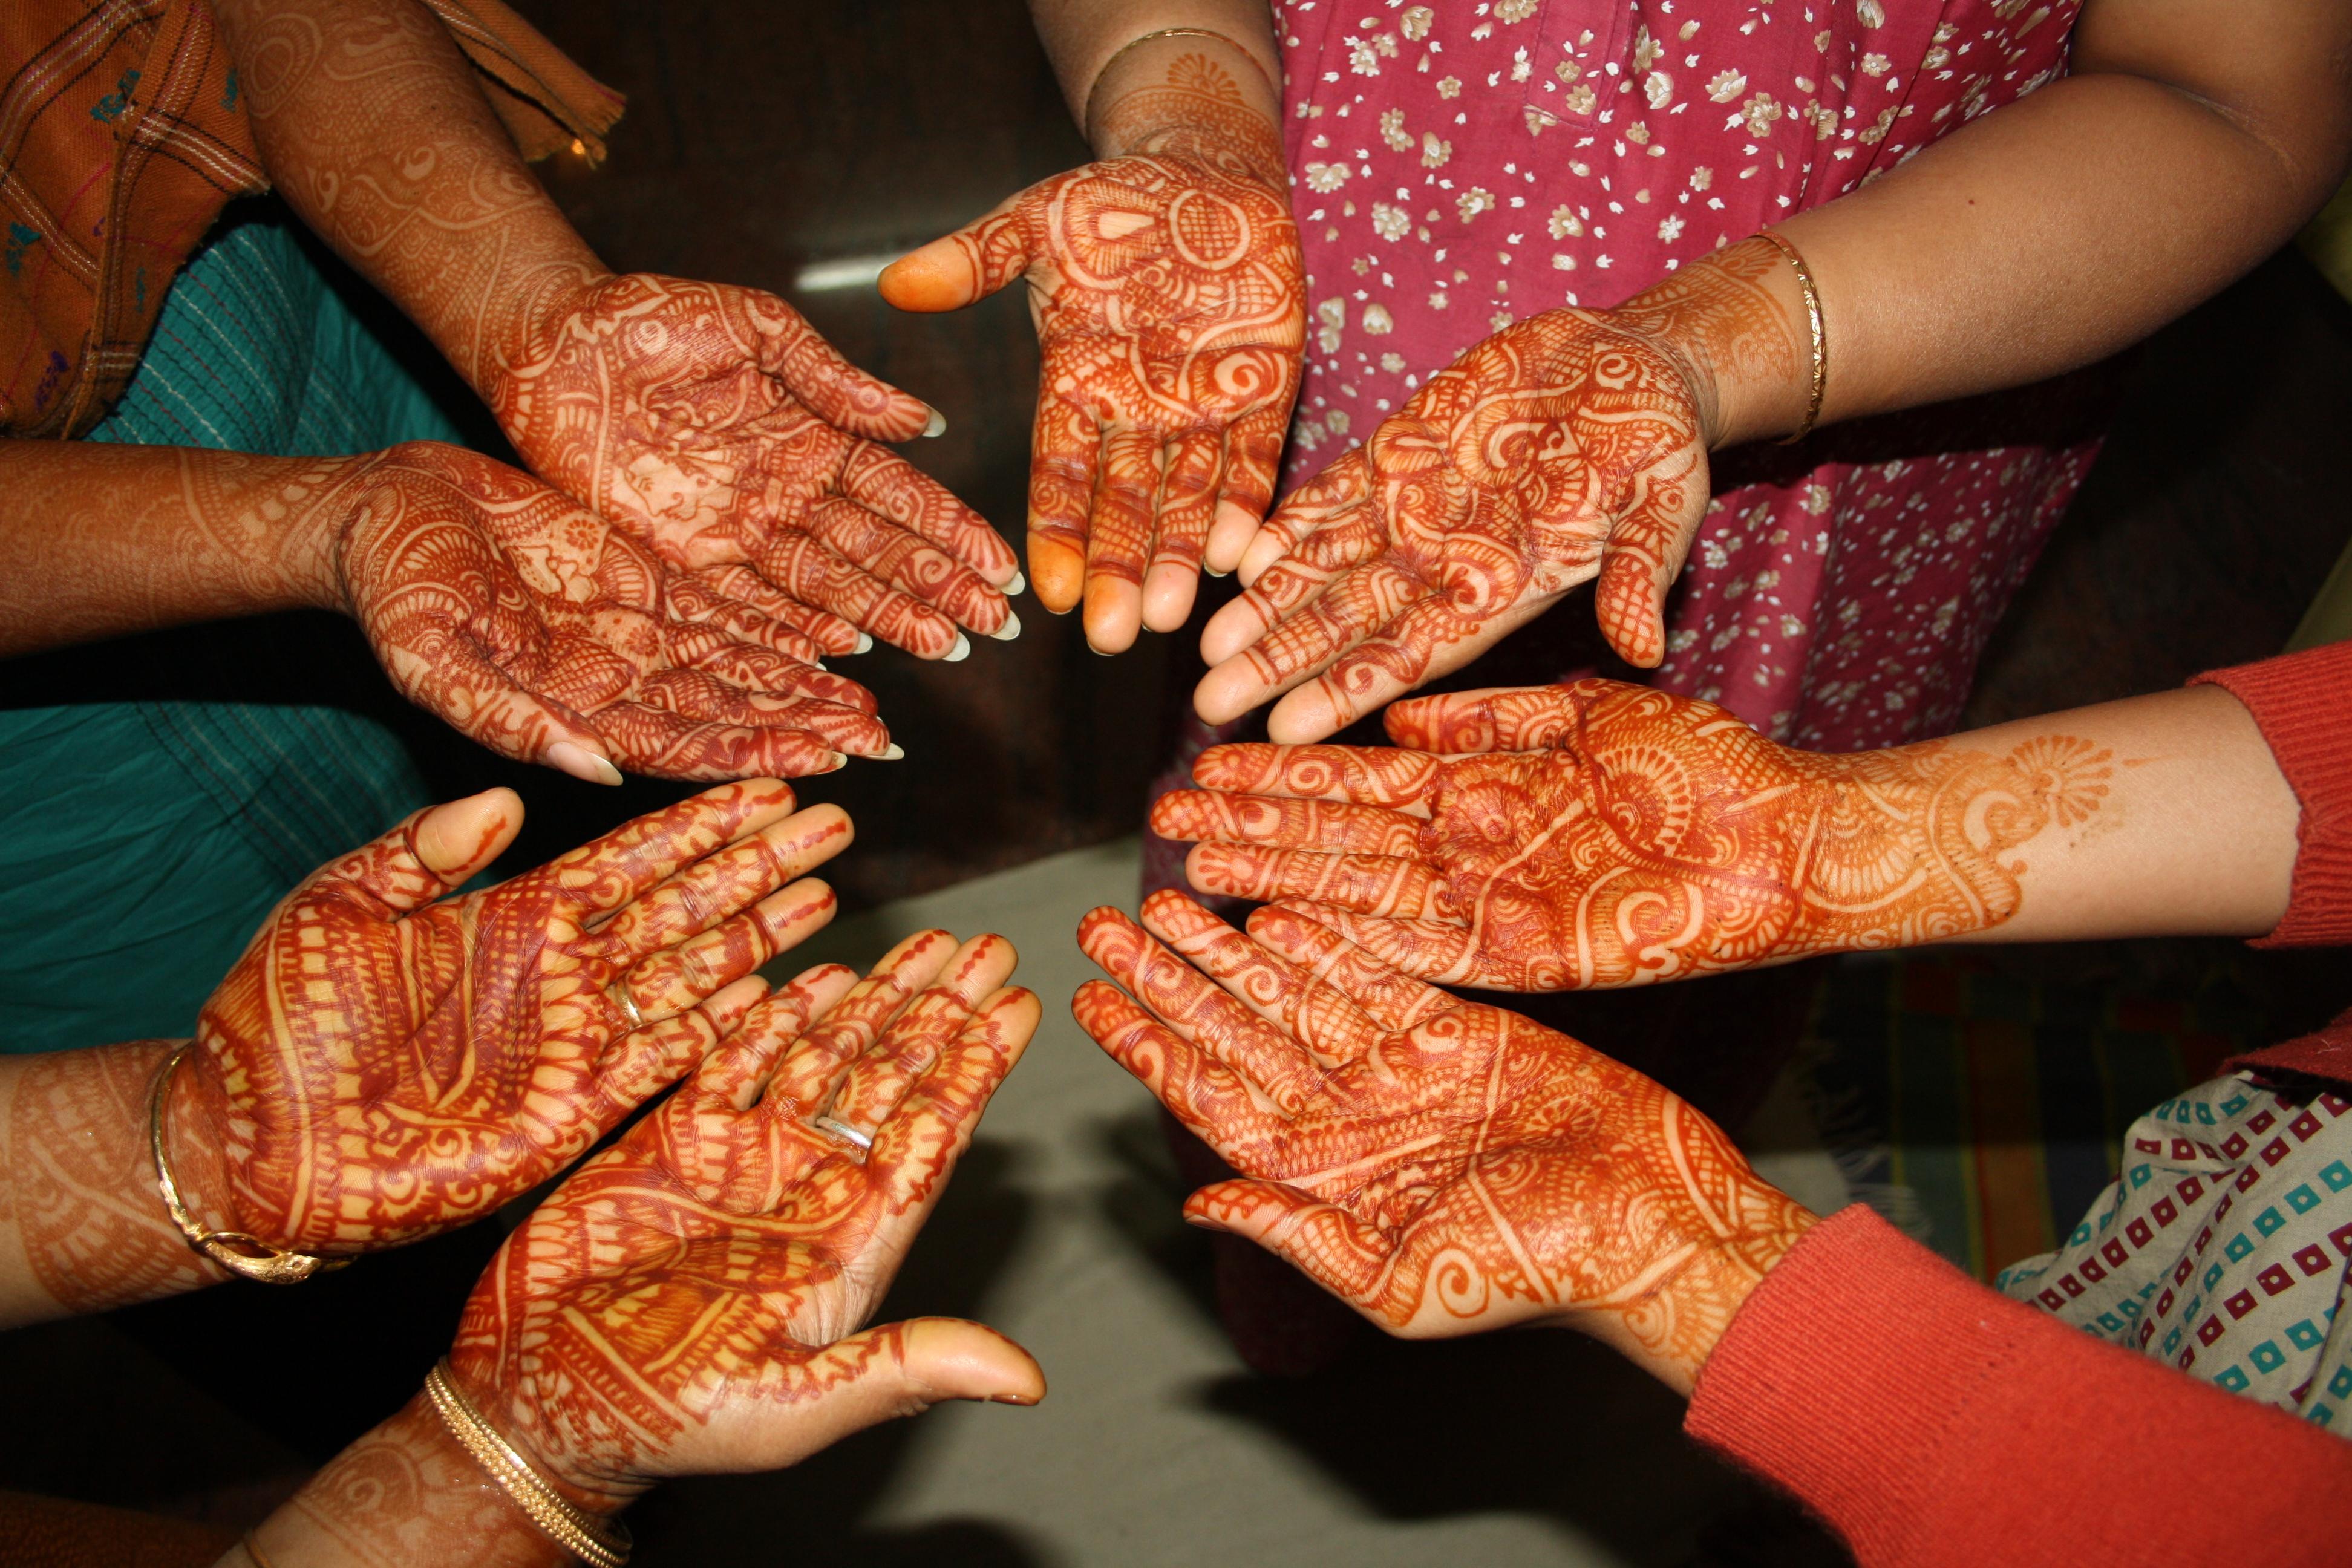 Mehndi Ceremony Wiki : File mehendi on hands g wikimedia commons